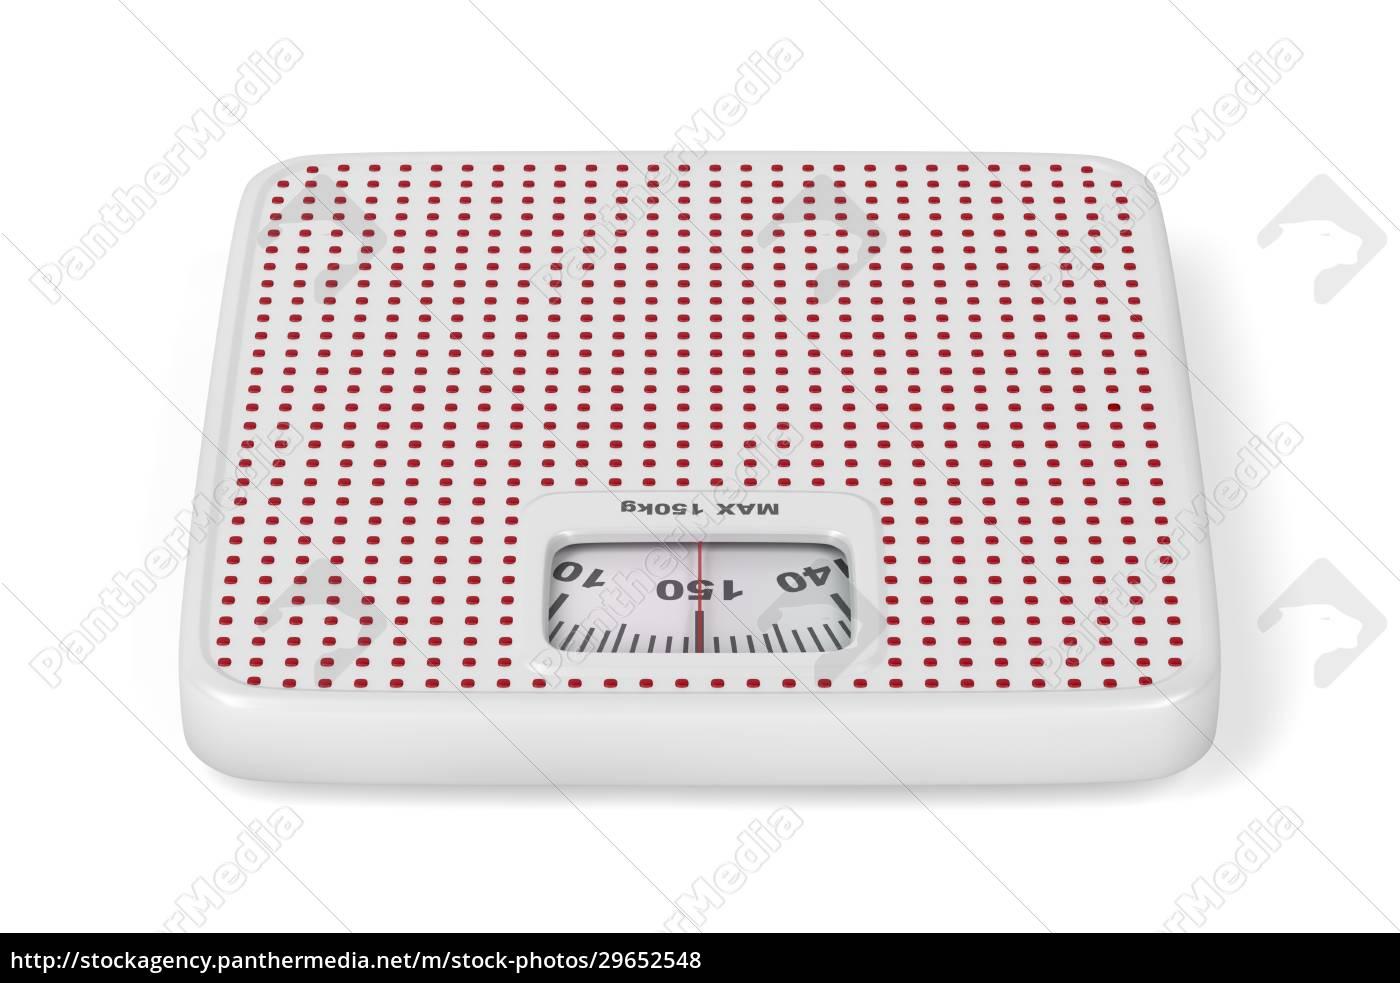 báscula, de, pesaje, mecánica, blanca - 29652548